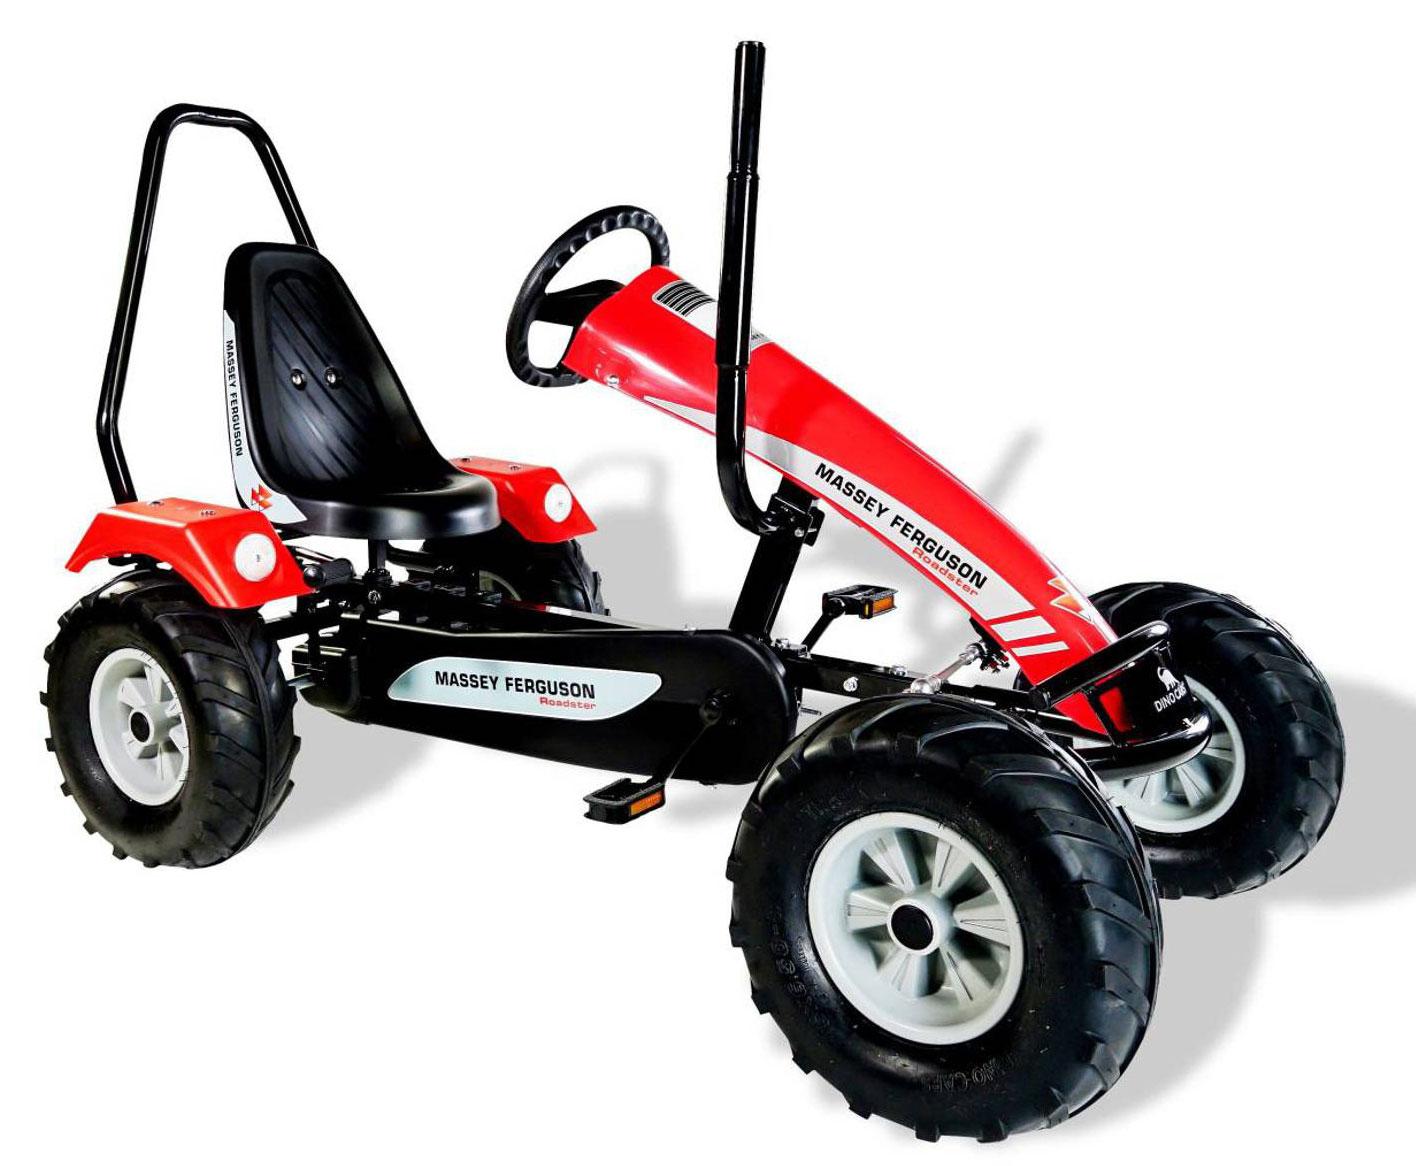 Gokart PedalGokart Track BF1 Massey Ferguson + Überrollbügel DINO CARS Bild 1